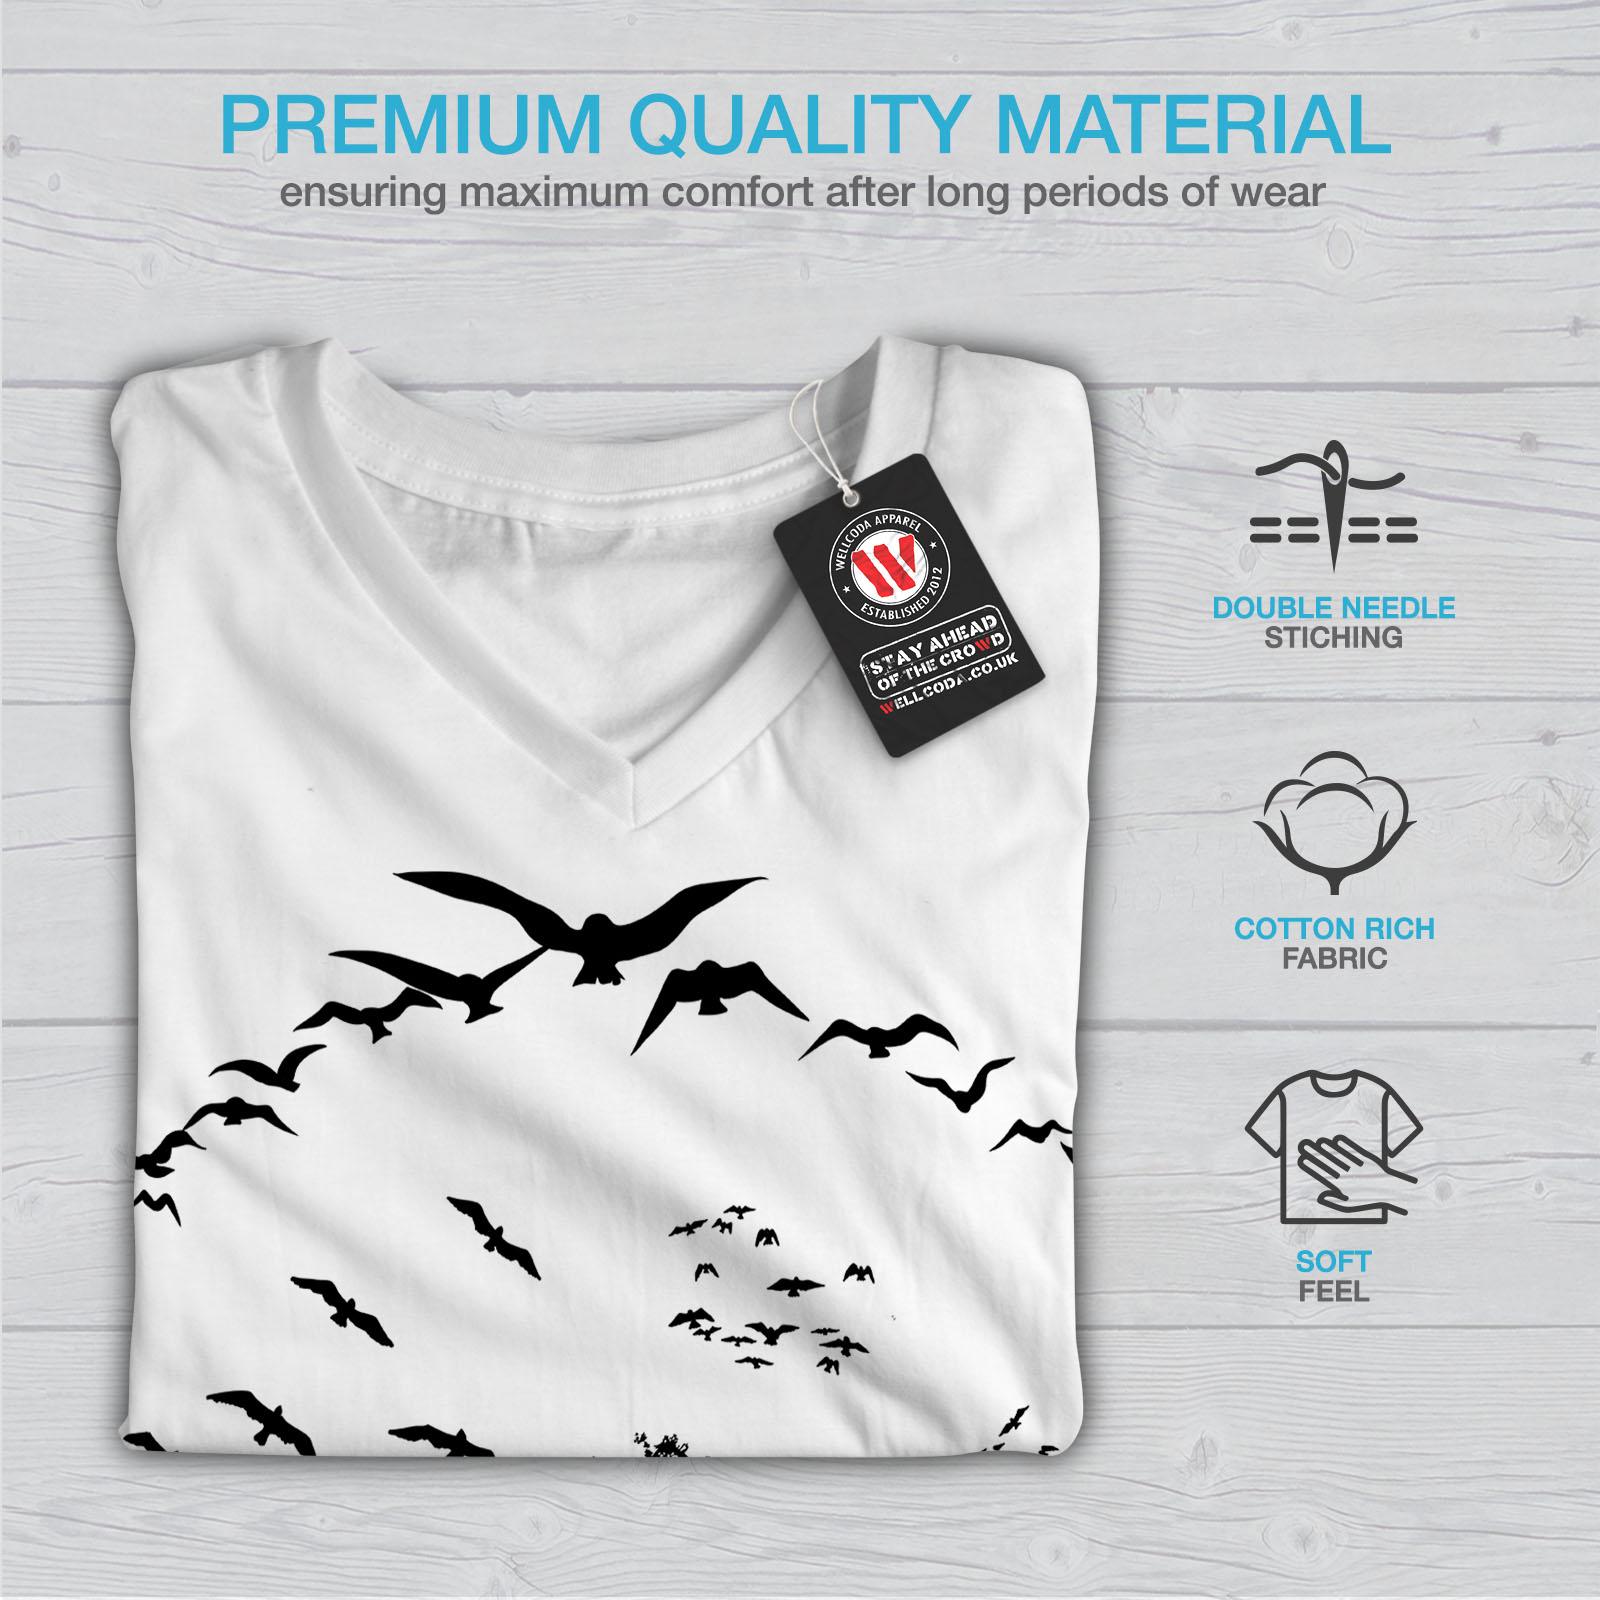 thumbnail 9 - Wellcoda-Bird-Freedom-Fly-Womens-V-Neck-T-shirt-Nature-Graphic-Design-Tee